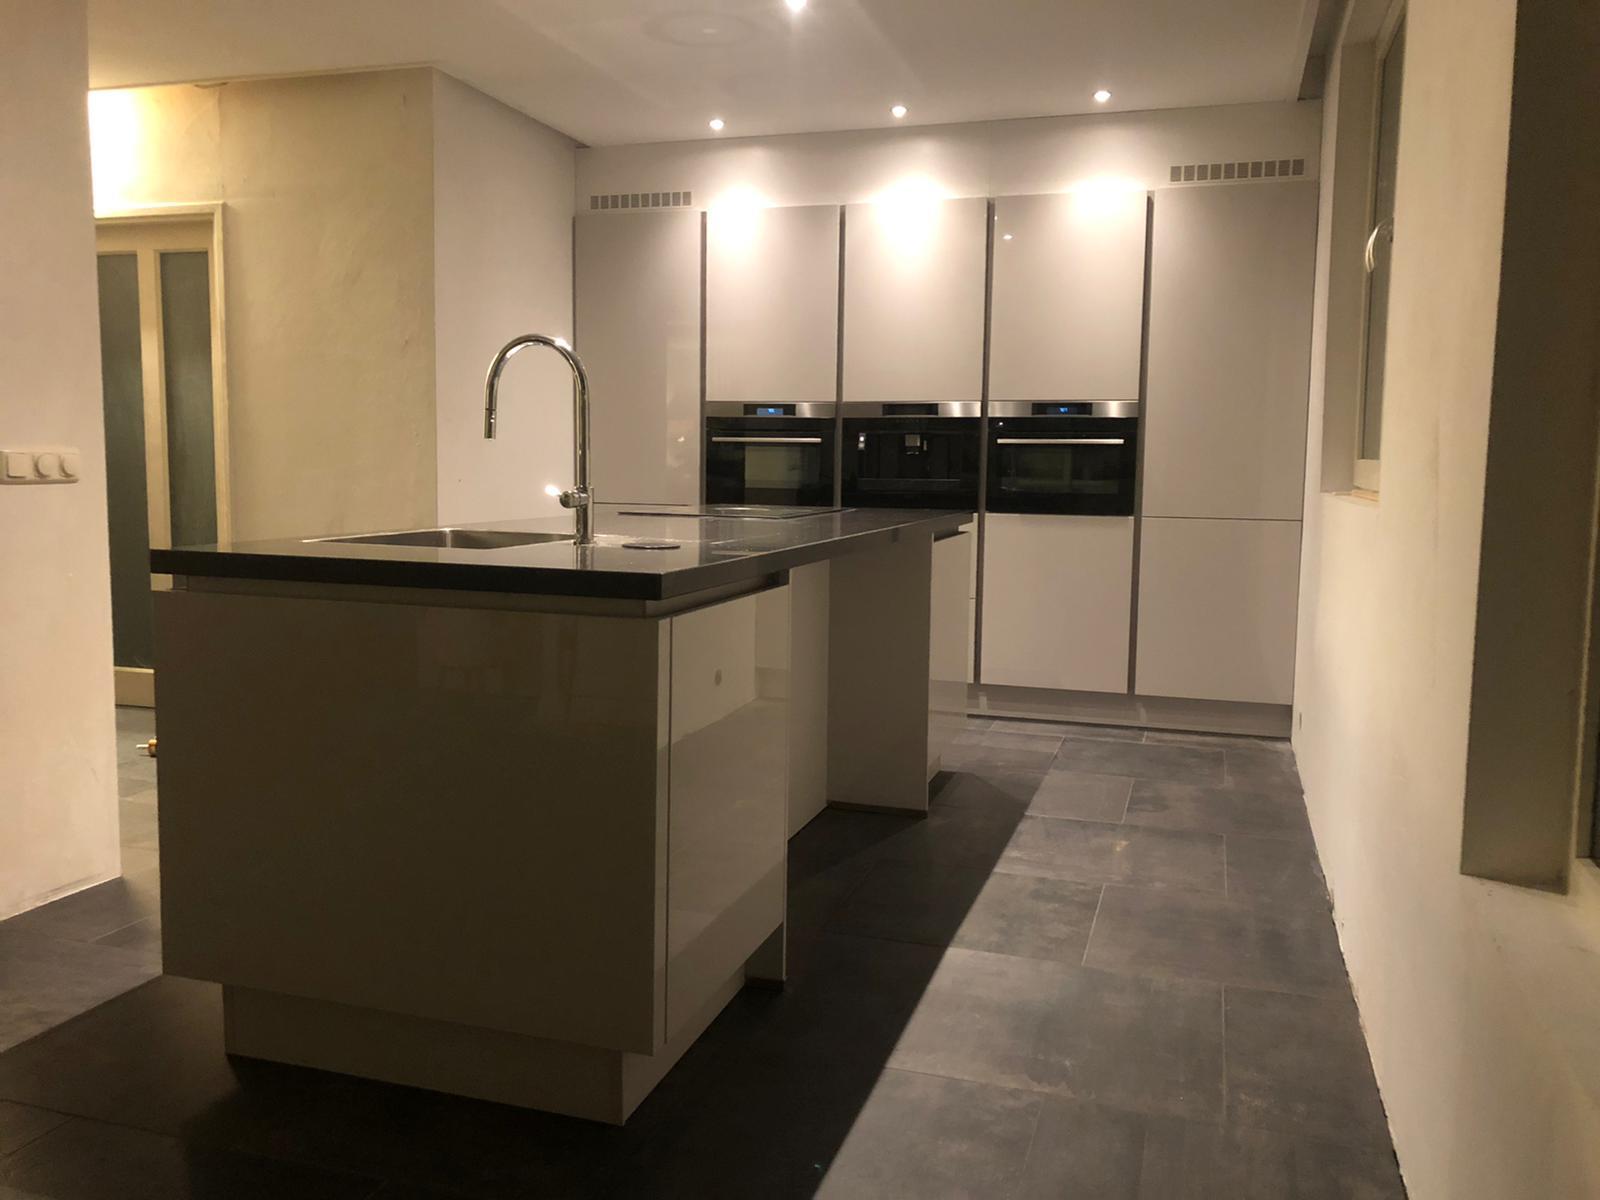 Keuken - montage & inbouw kastenwand